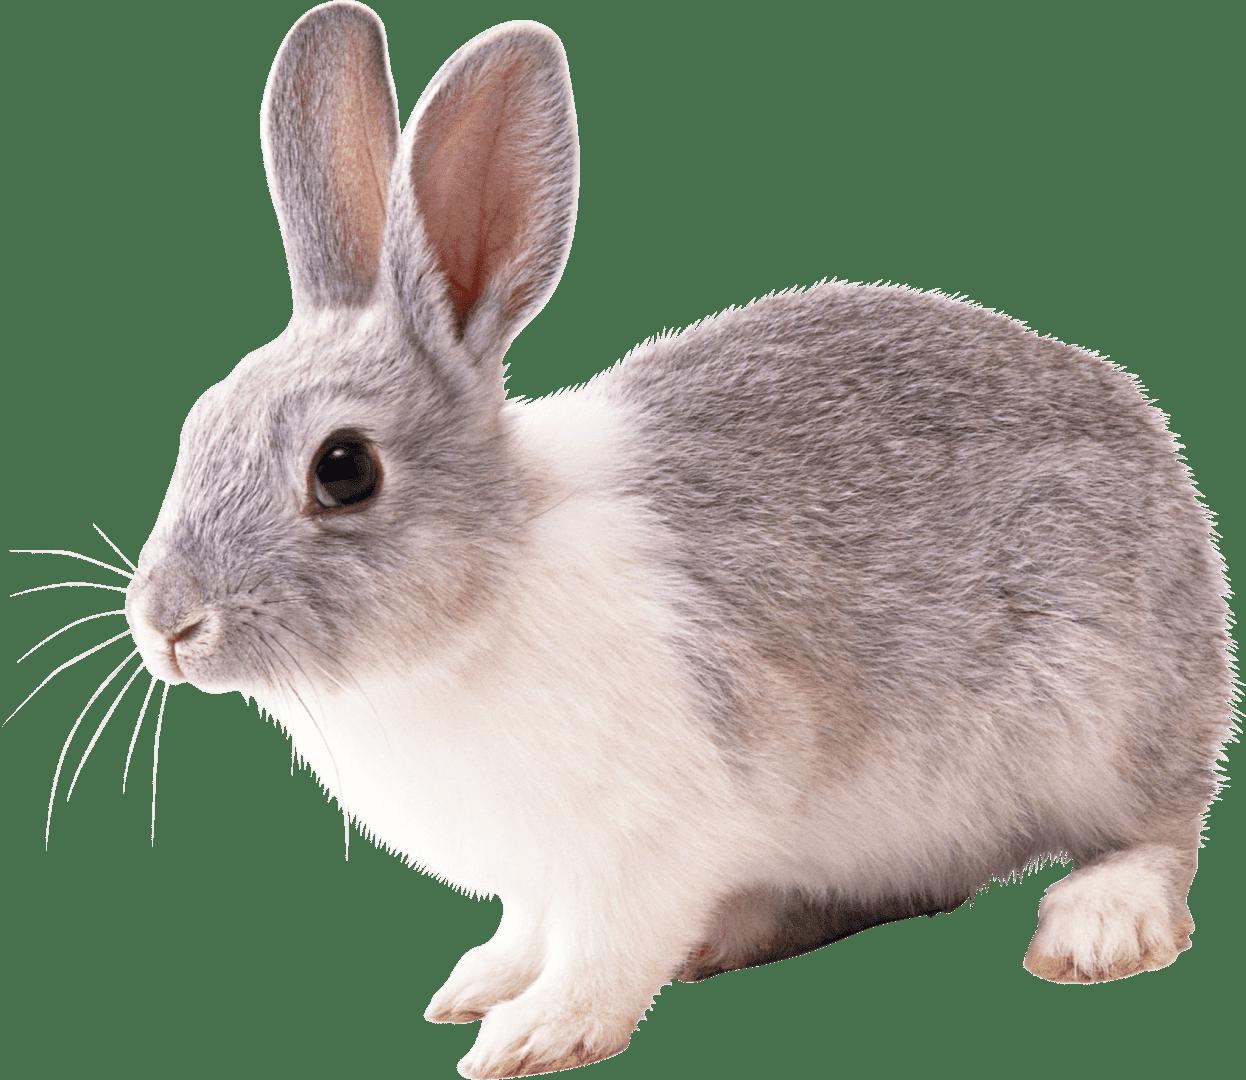 White Rabbit Images Rabbit Png Images And Png Clipart Pet Rats Rabbit Cartoon Images Rabbit